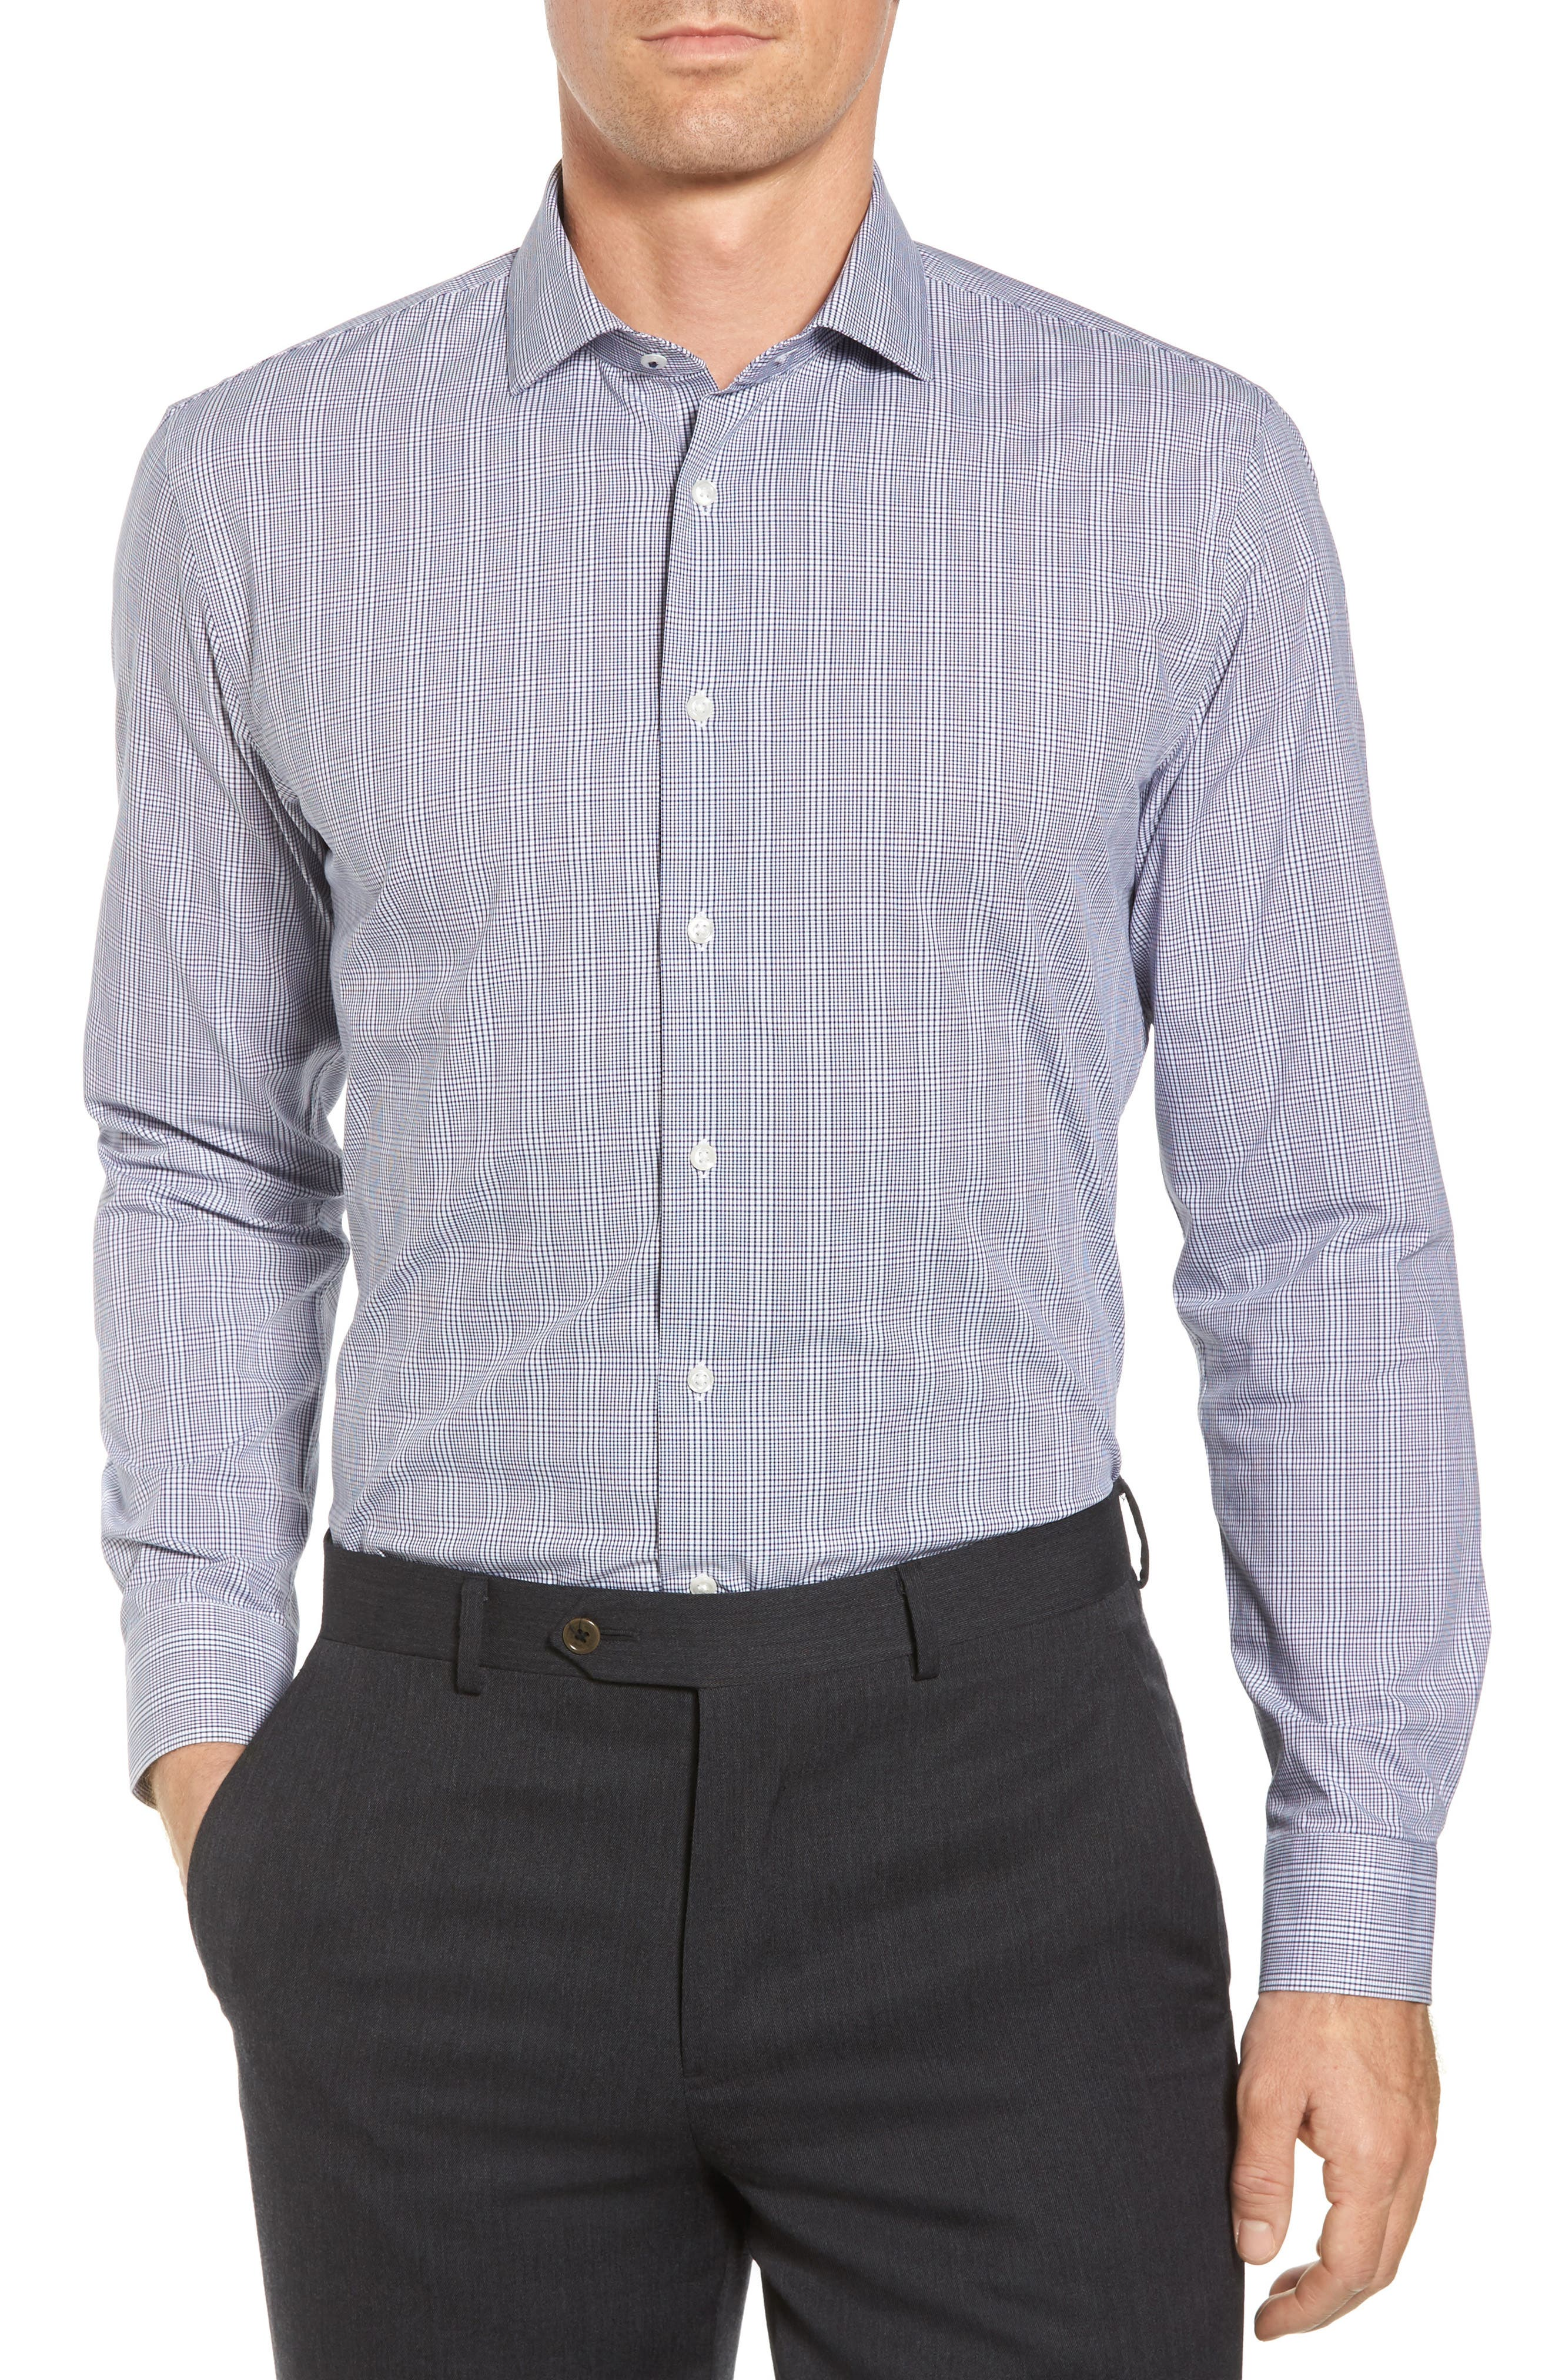 Tech-Smart Trim Fit Stretch Plaid Dress Shirt,                         Main,                         color, Blue Twilight